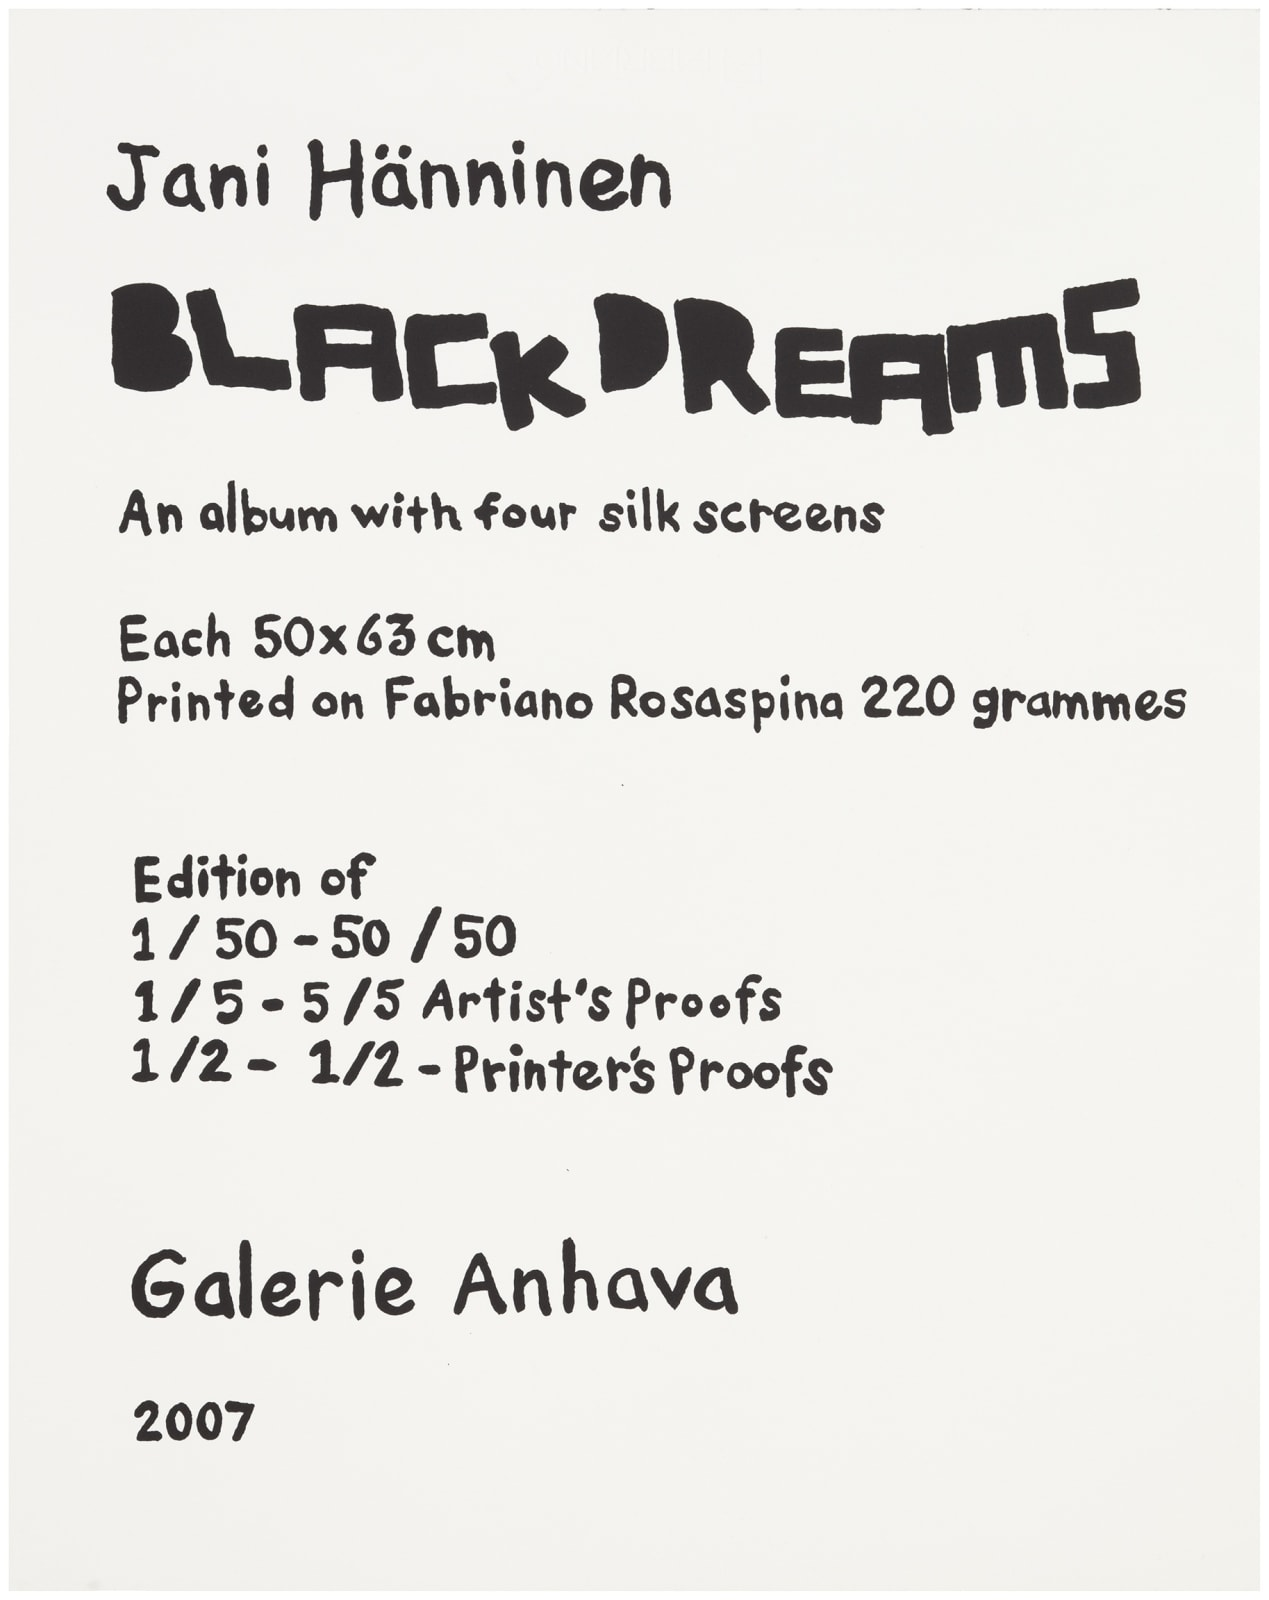 Full album with four prints € 600